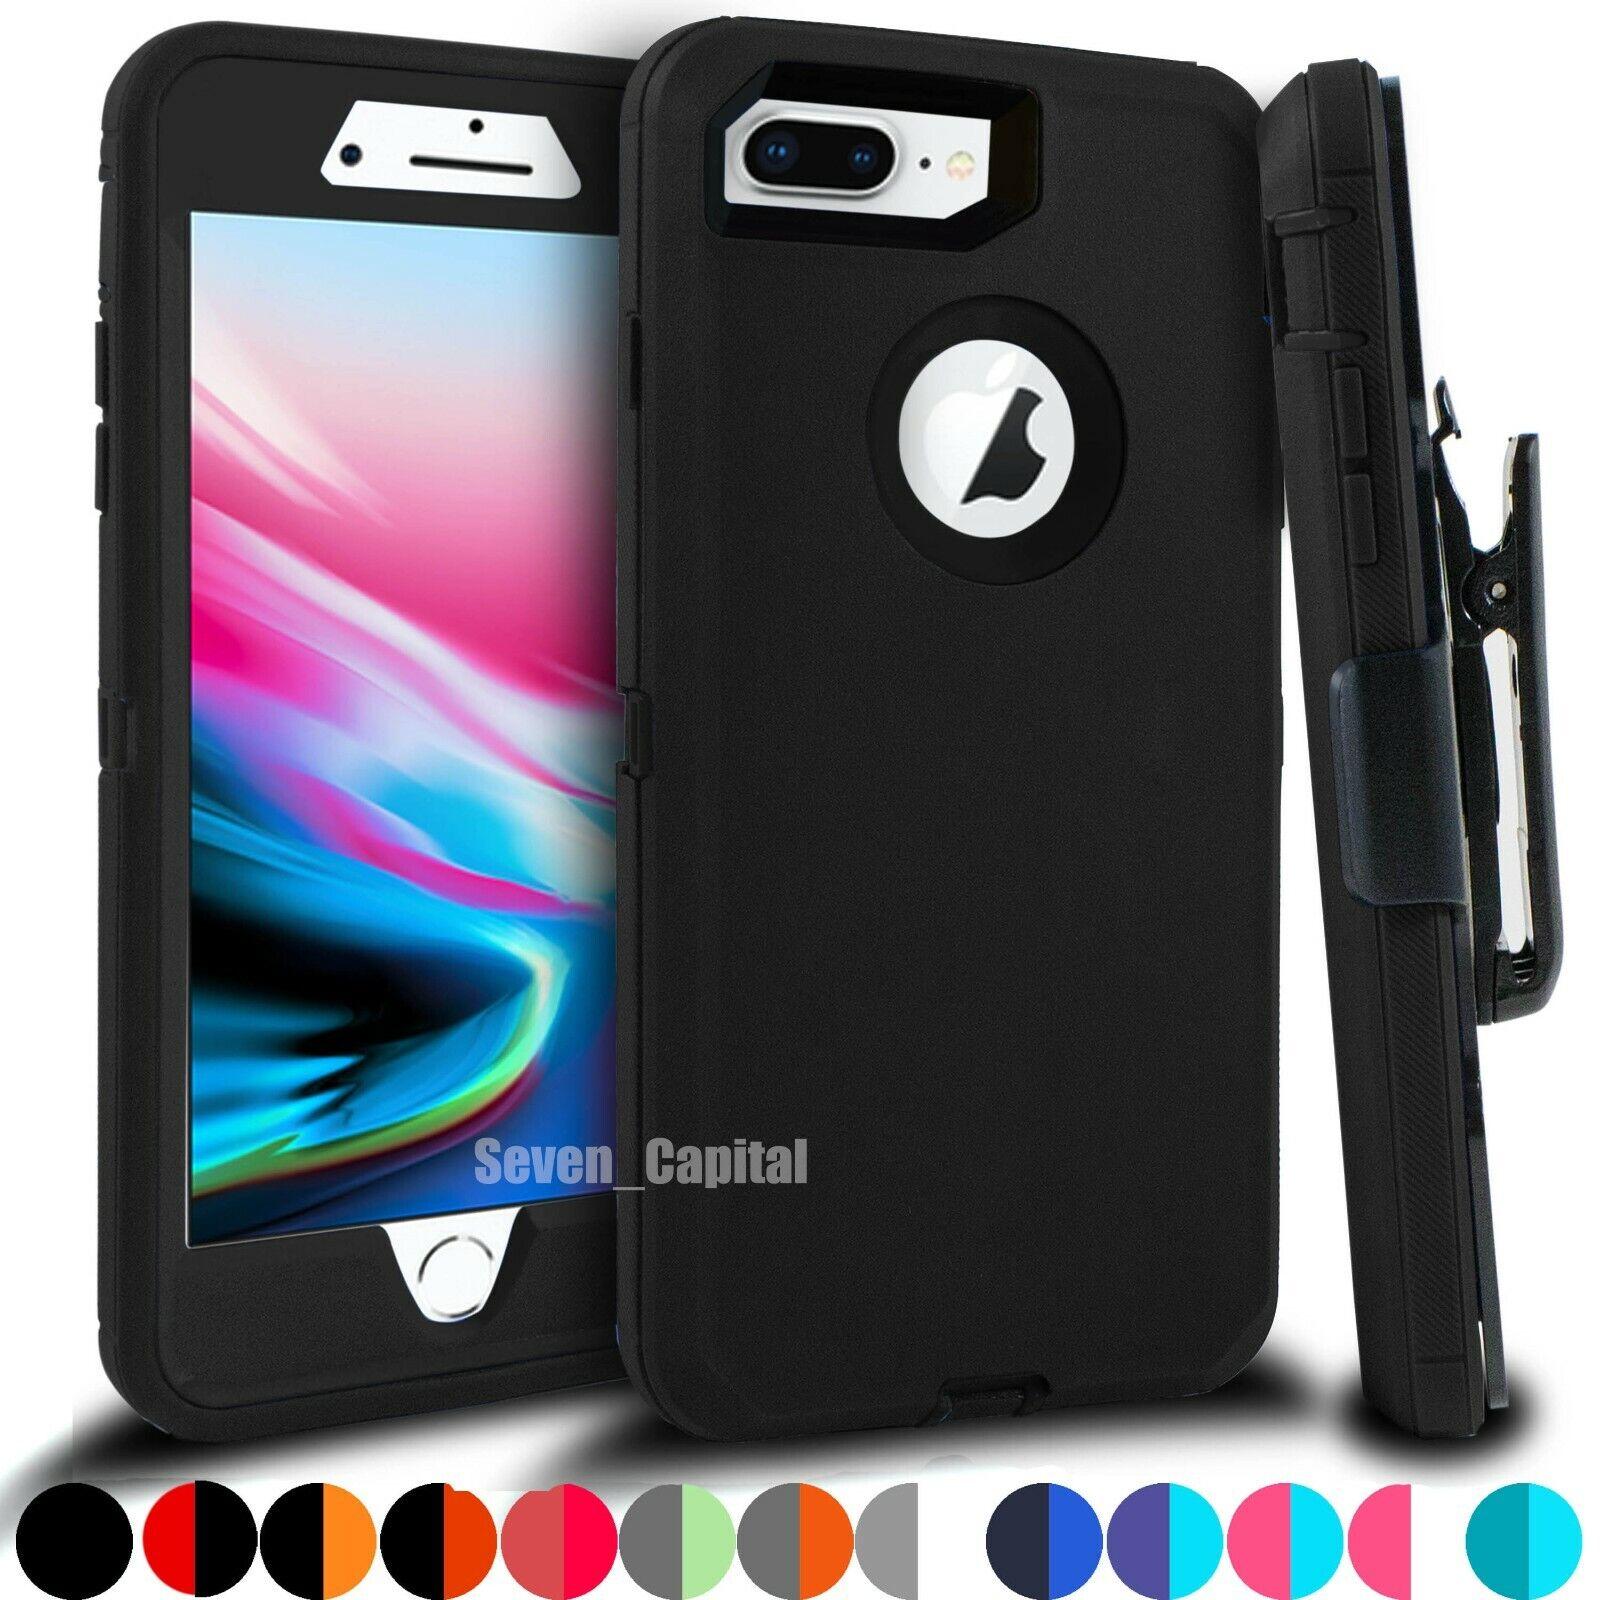 Sena Magnetic Holster Leather Holster With Belt Clip For Iphone 7 Black For Sale Online Ebay